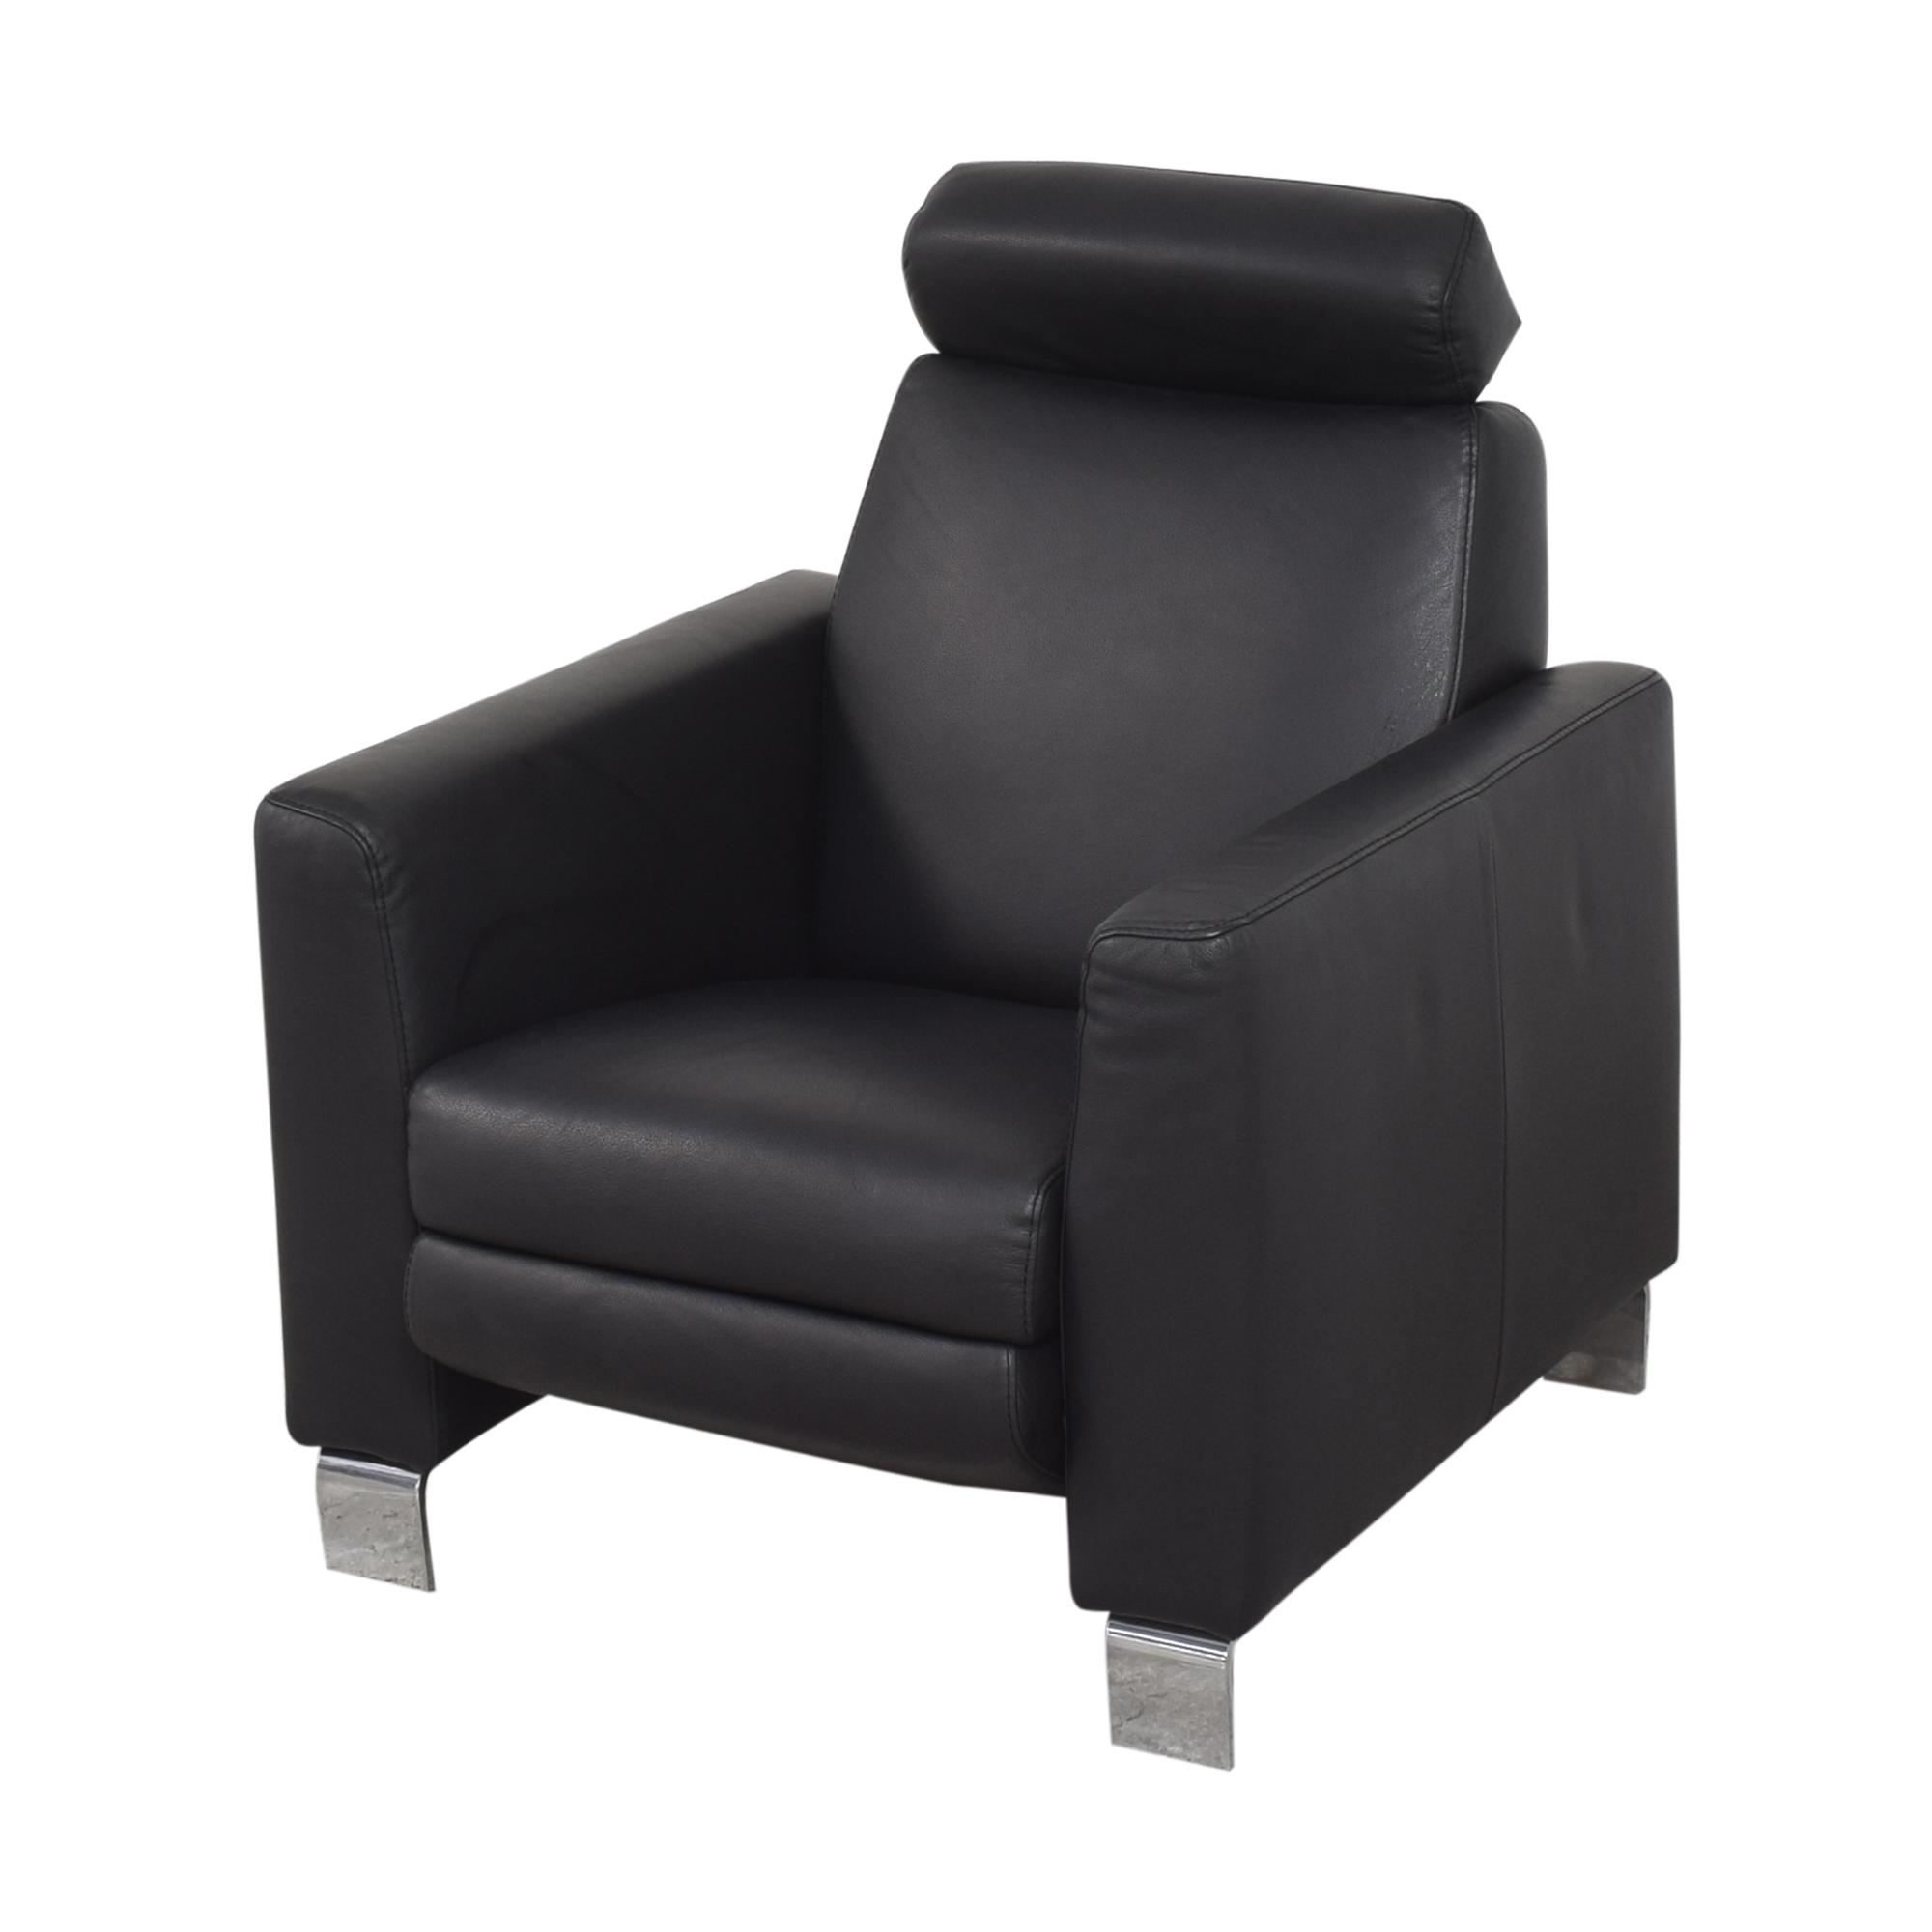 Modern Reclining Armchair Chairs